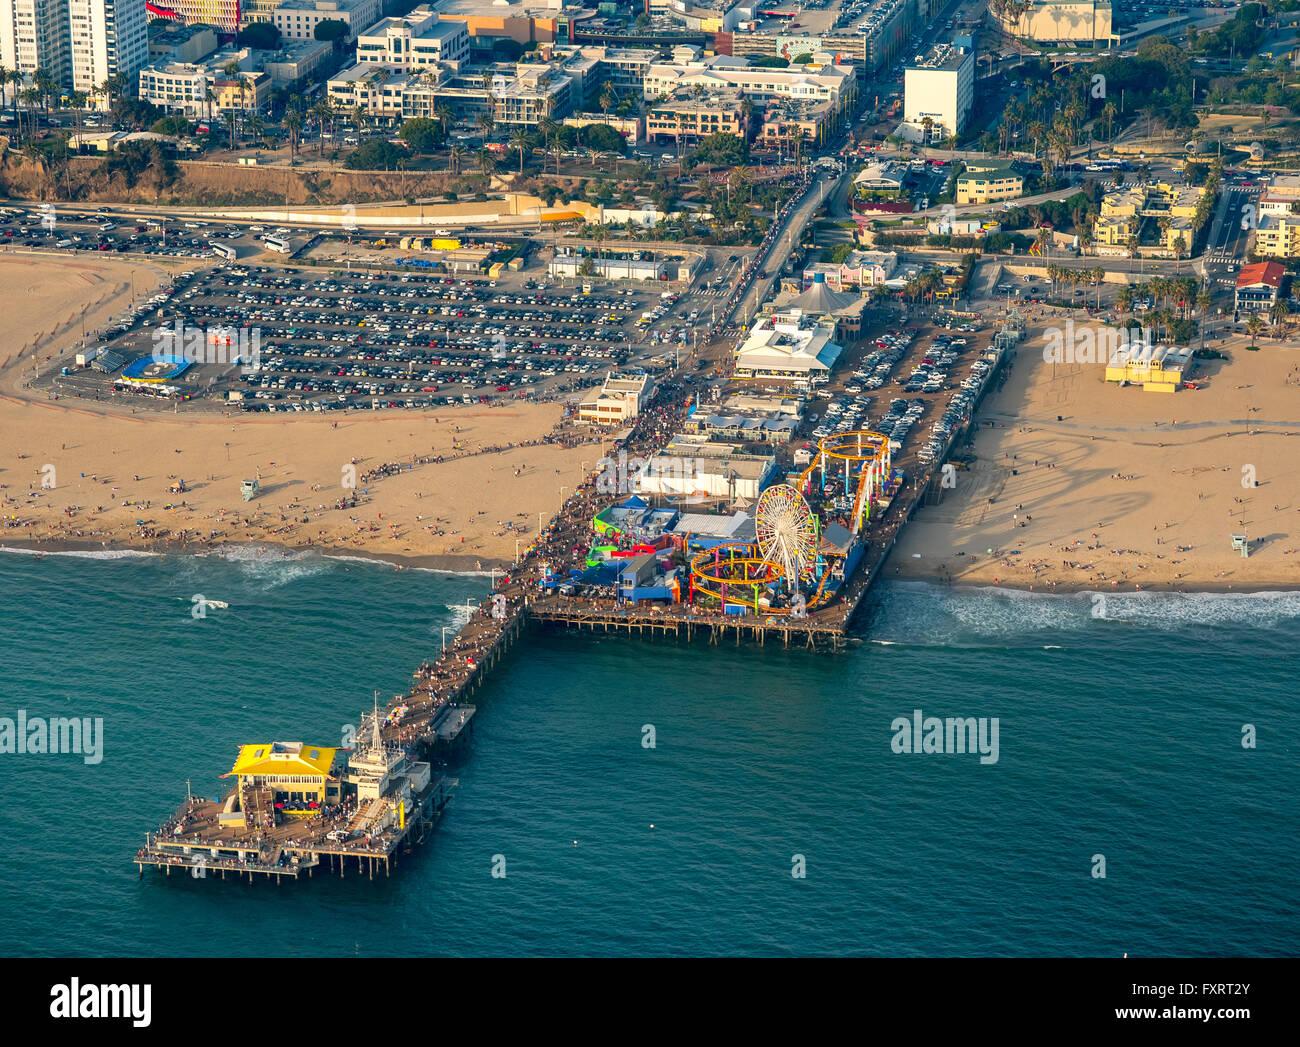 Aerial View Pacific Ocean Santa Monica Pier Rollercoaster Ferris Stock Photo Royalty Free